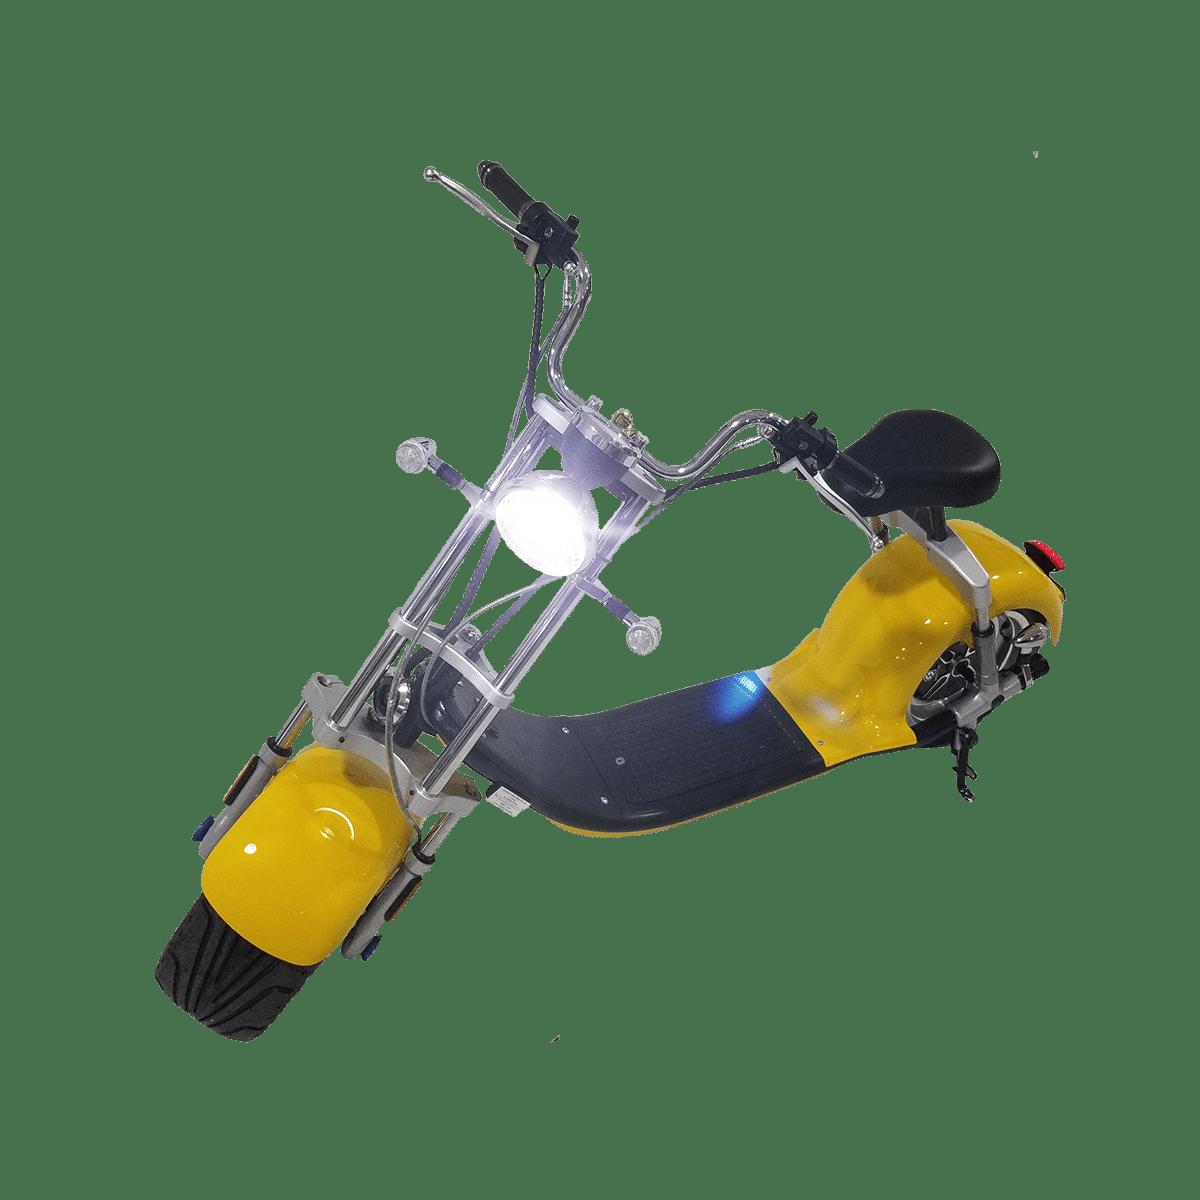 Citycoco Harley Deluxe Jaune avec 1 batterie offerte en plus